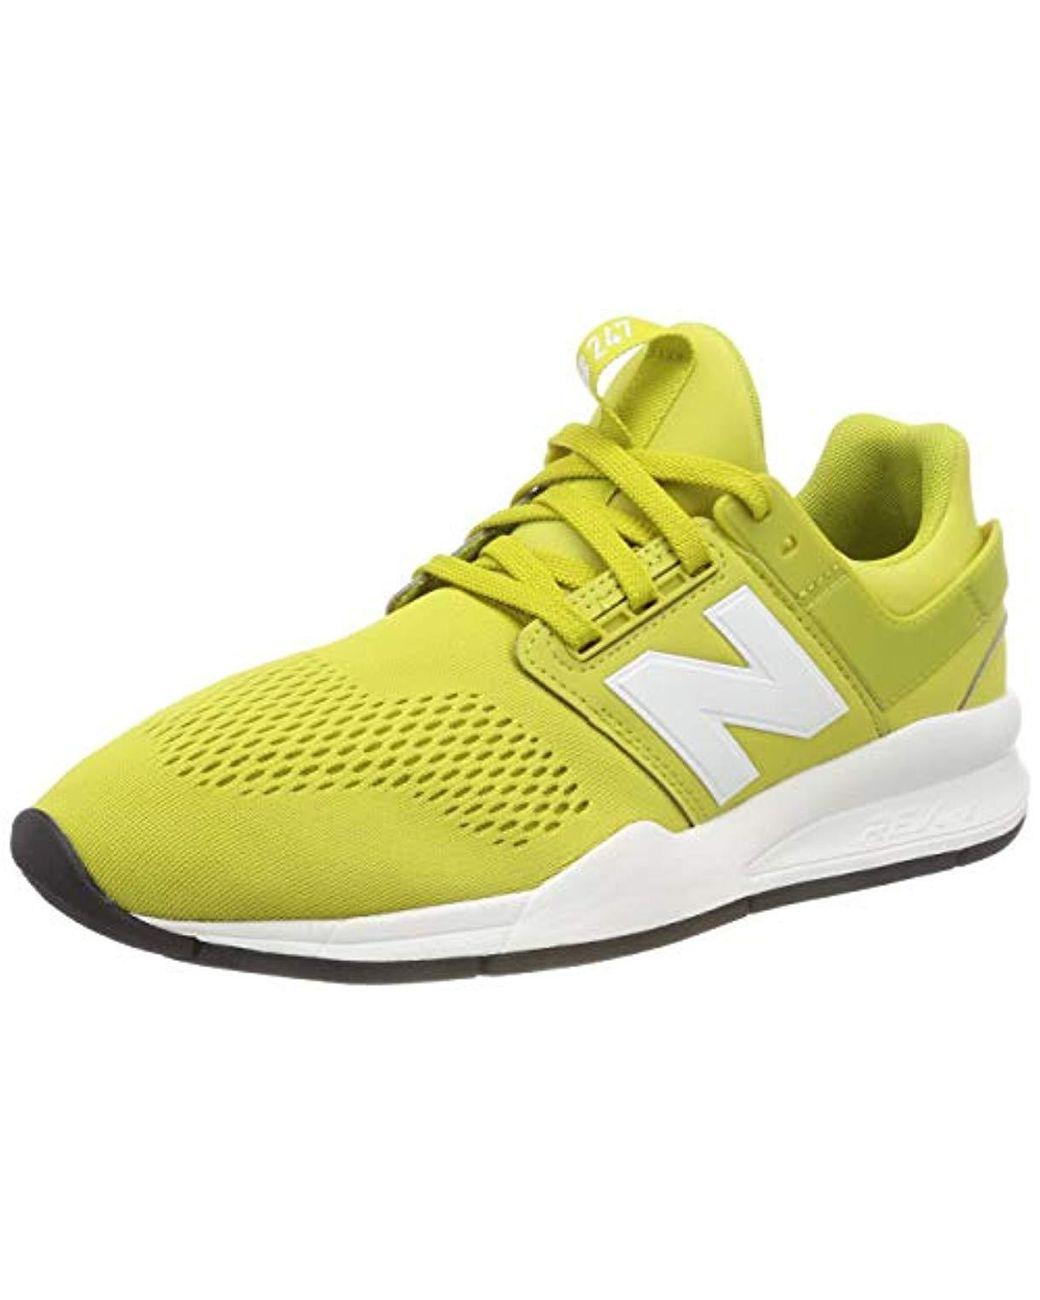 Herren 247v2 Sneaker in gelb